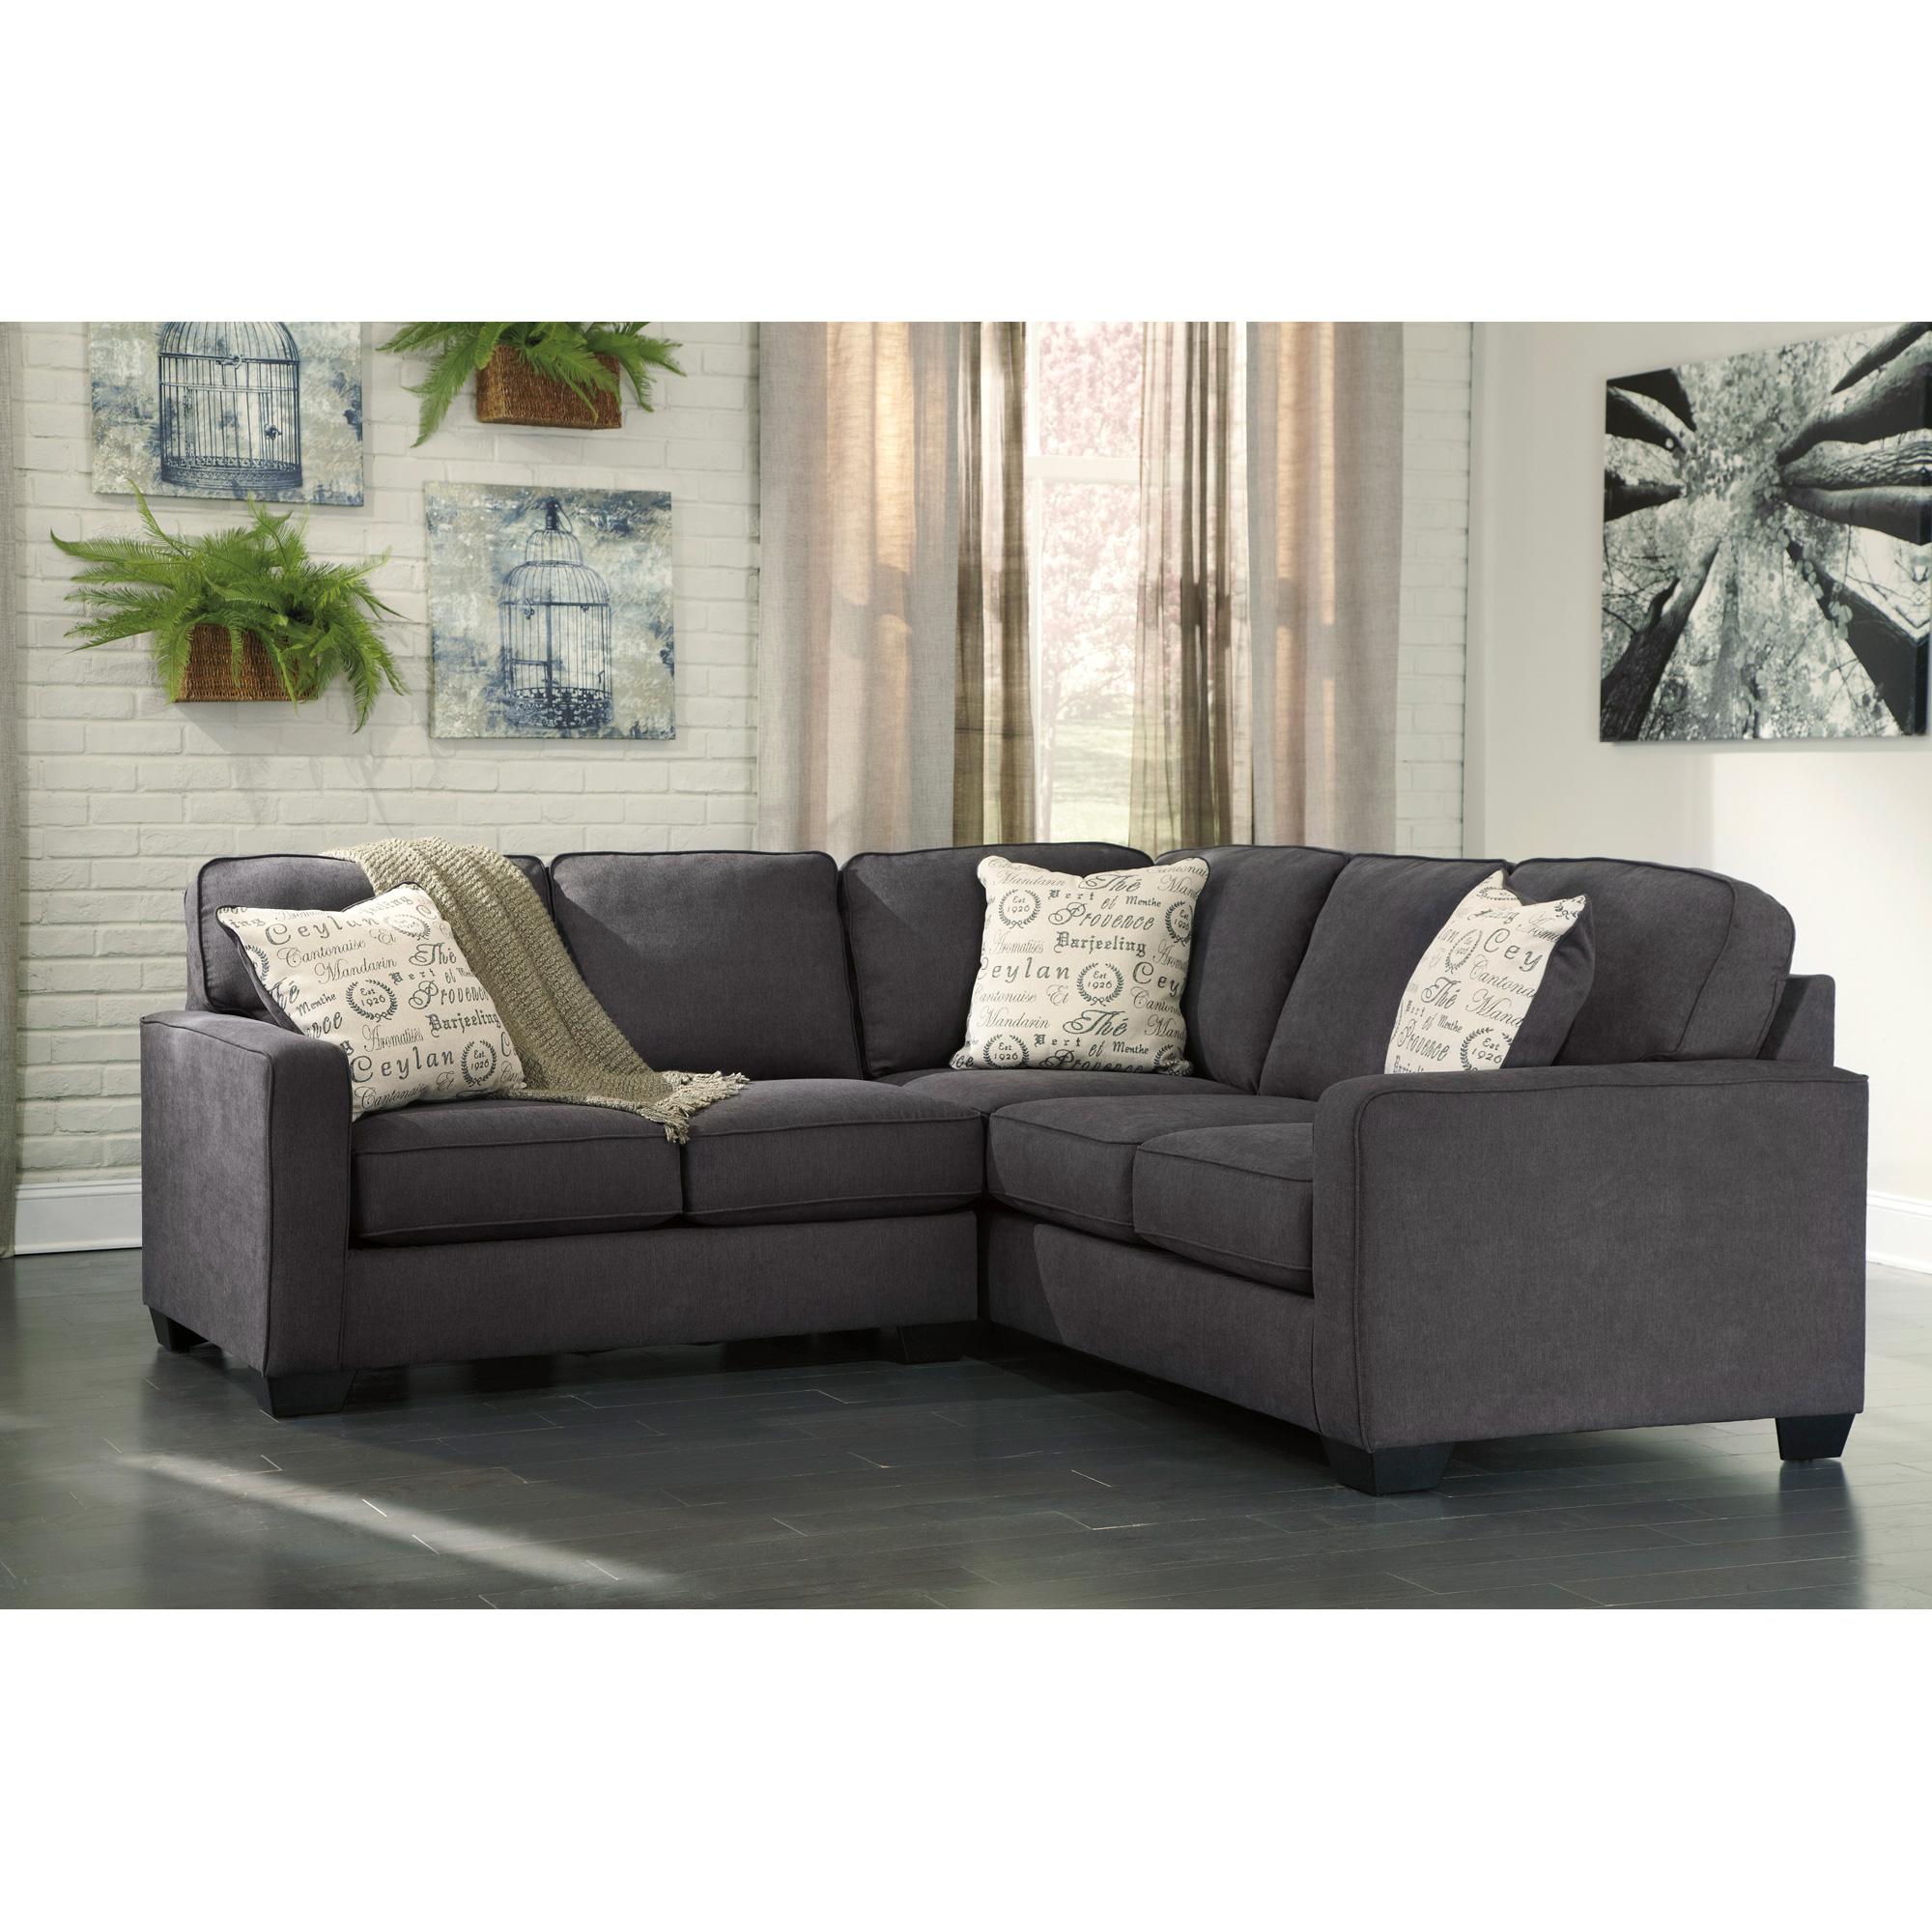 Ashley Furniture | Alenya Charcoal 2 Piece Left Sectional Sofa